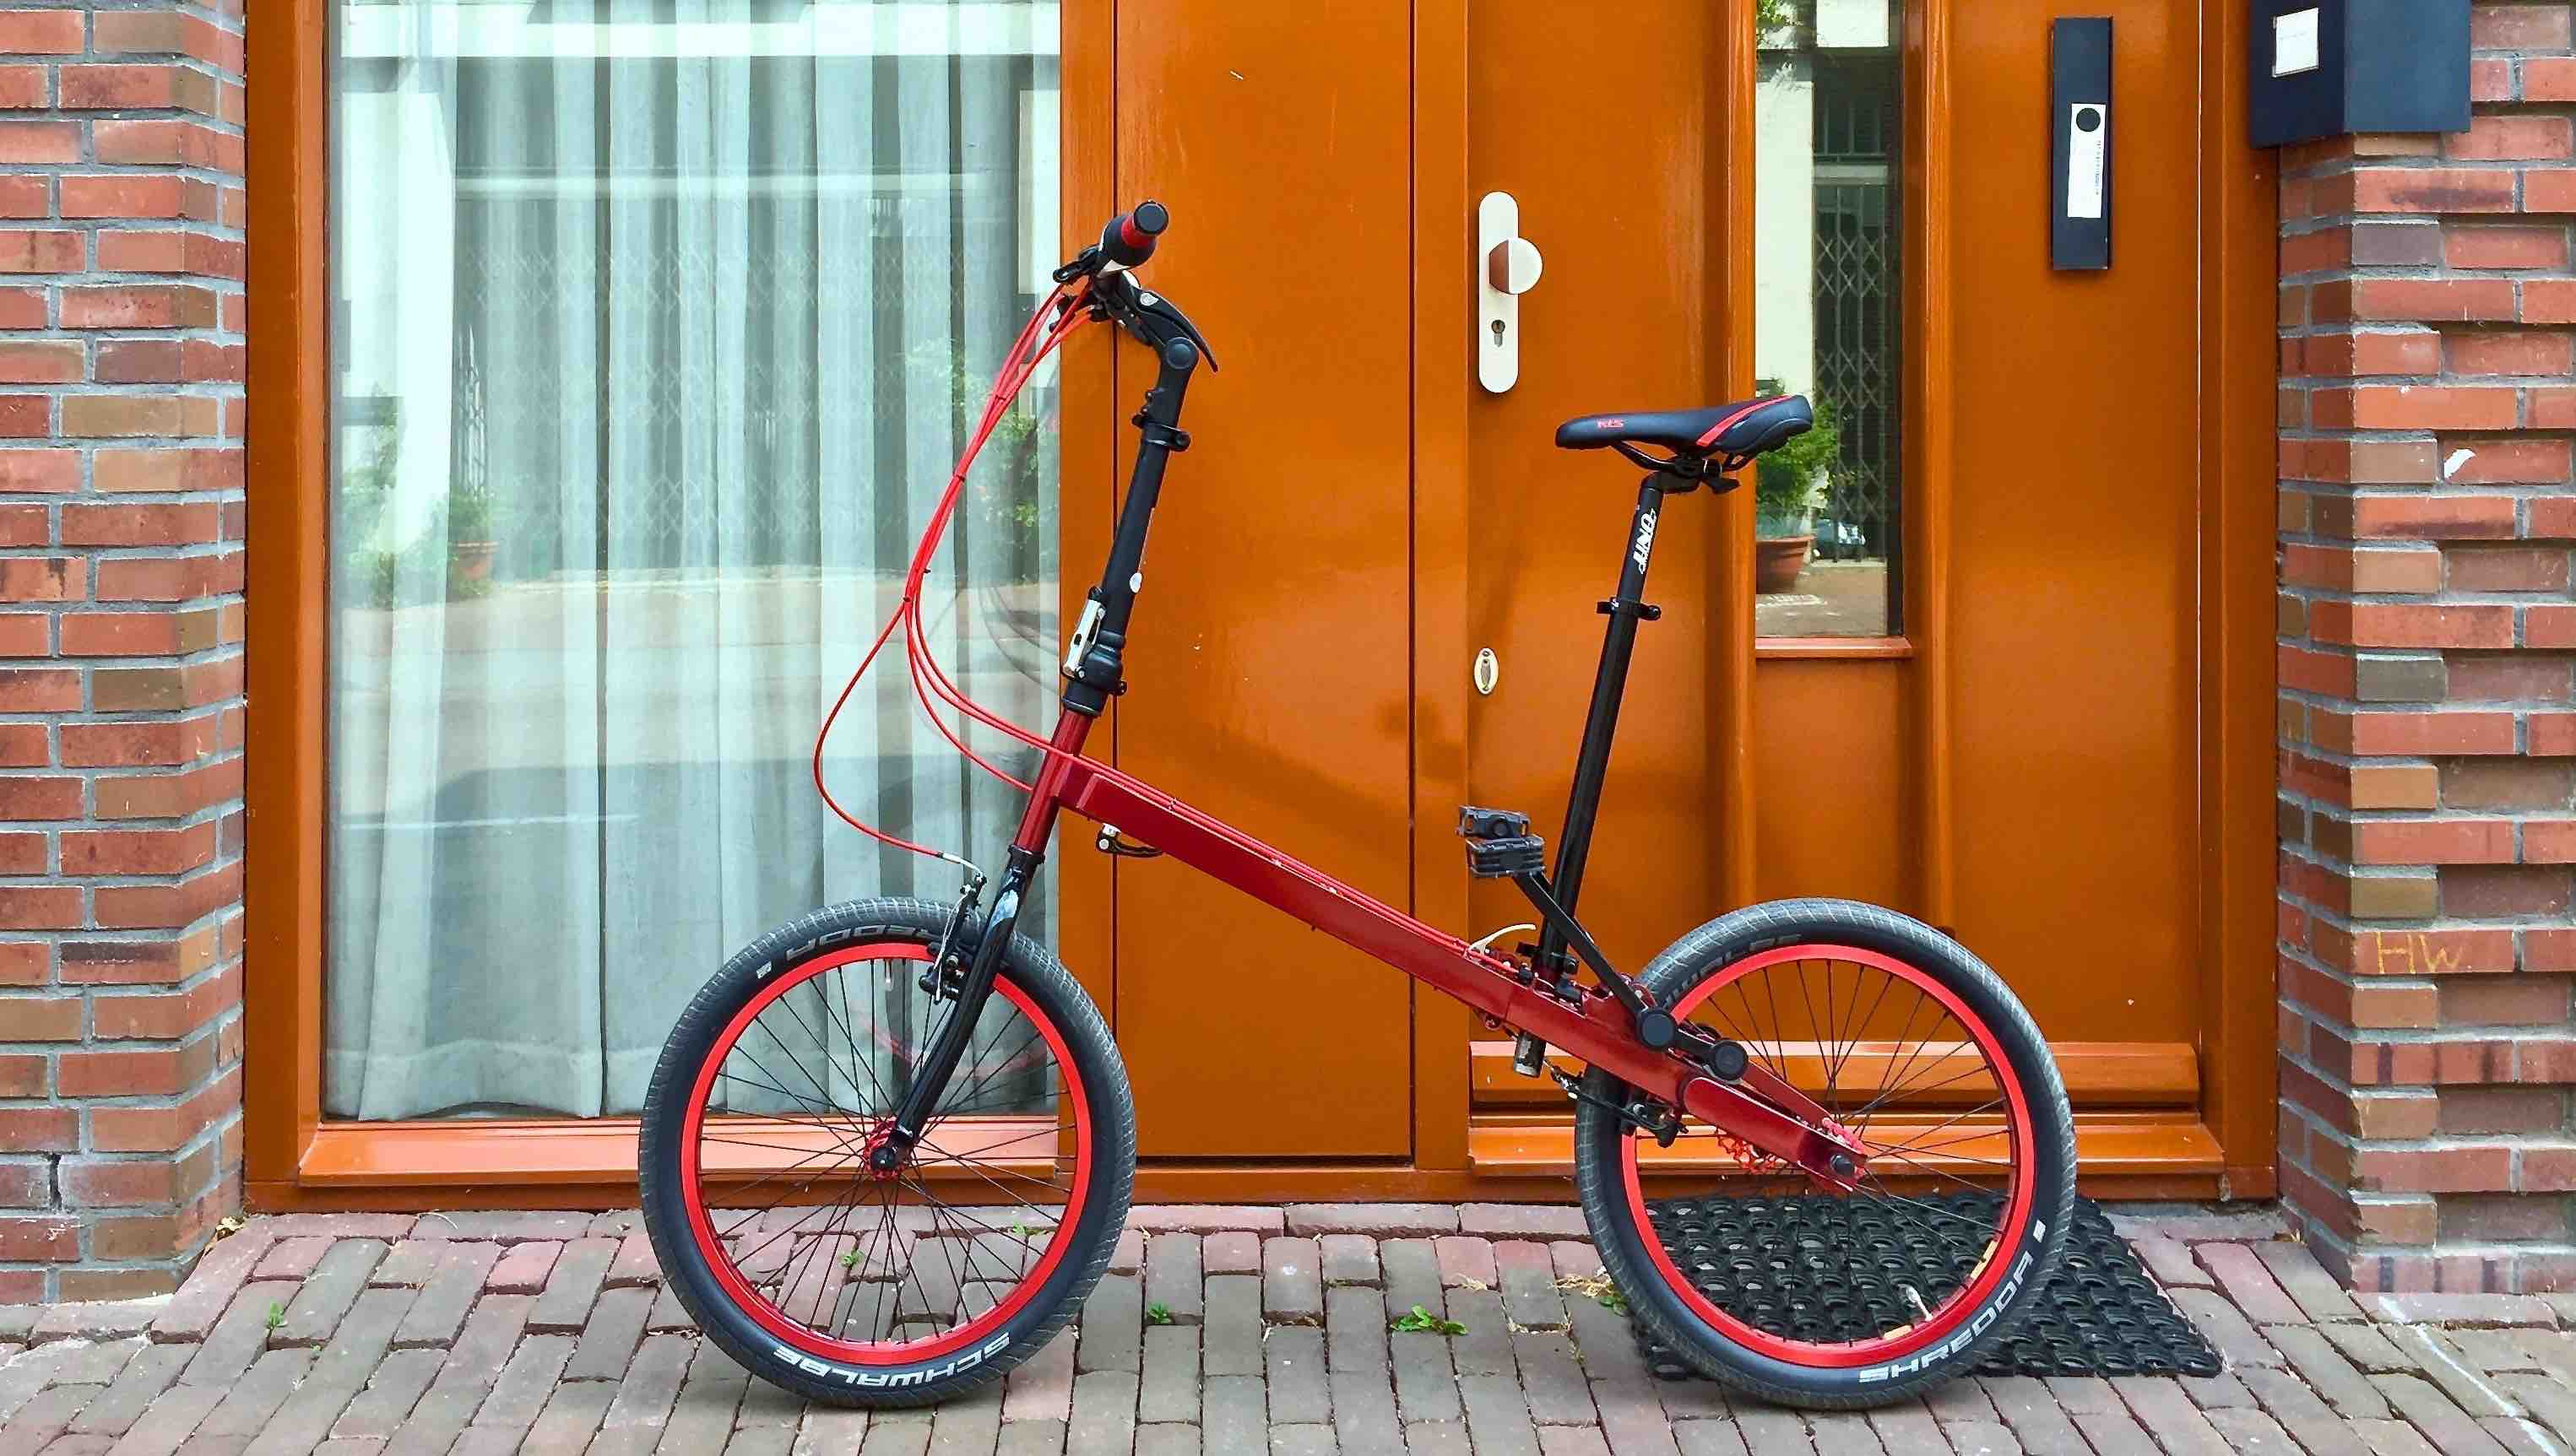 StepTwin Bike – Bionic Folding Bike